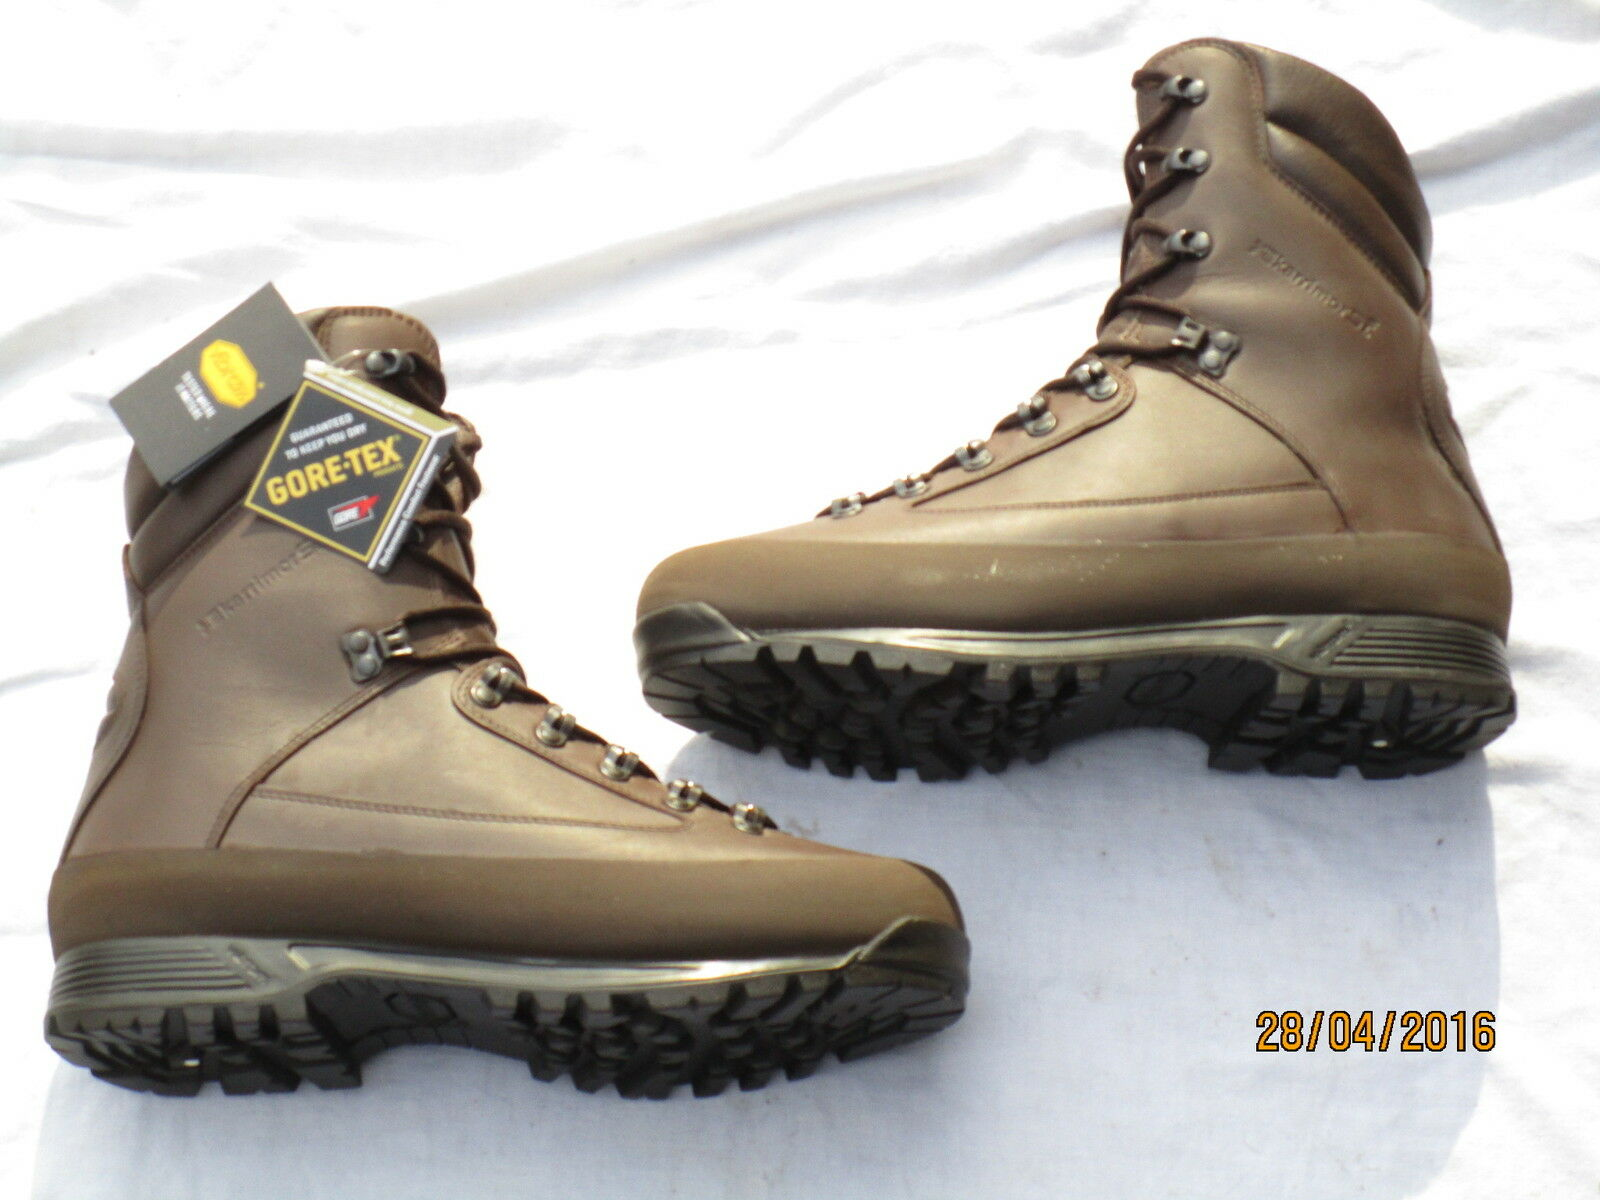 Karrimor, botas Combat Cold Wet Weather, marrón Macho, Mtp , Goretex,Talla 8m(42)